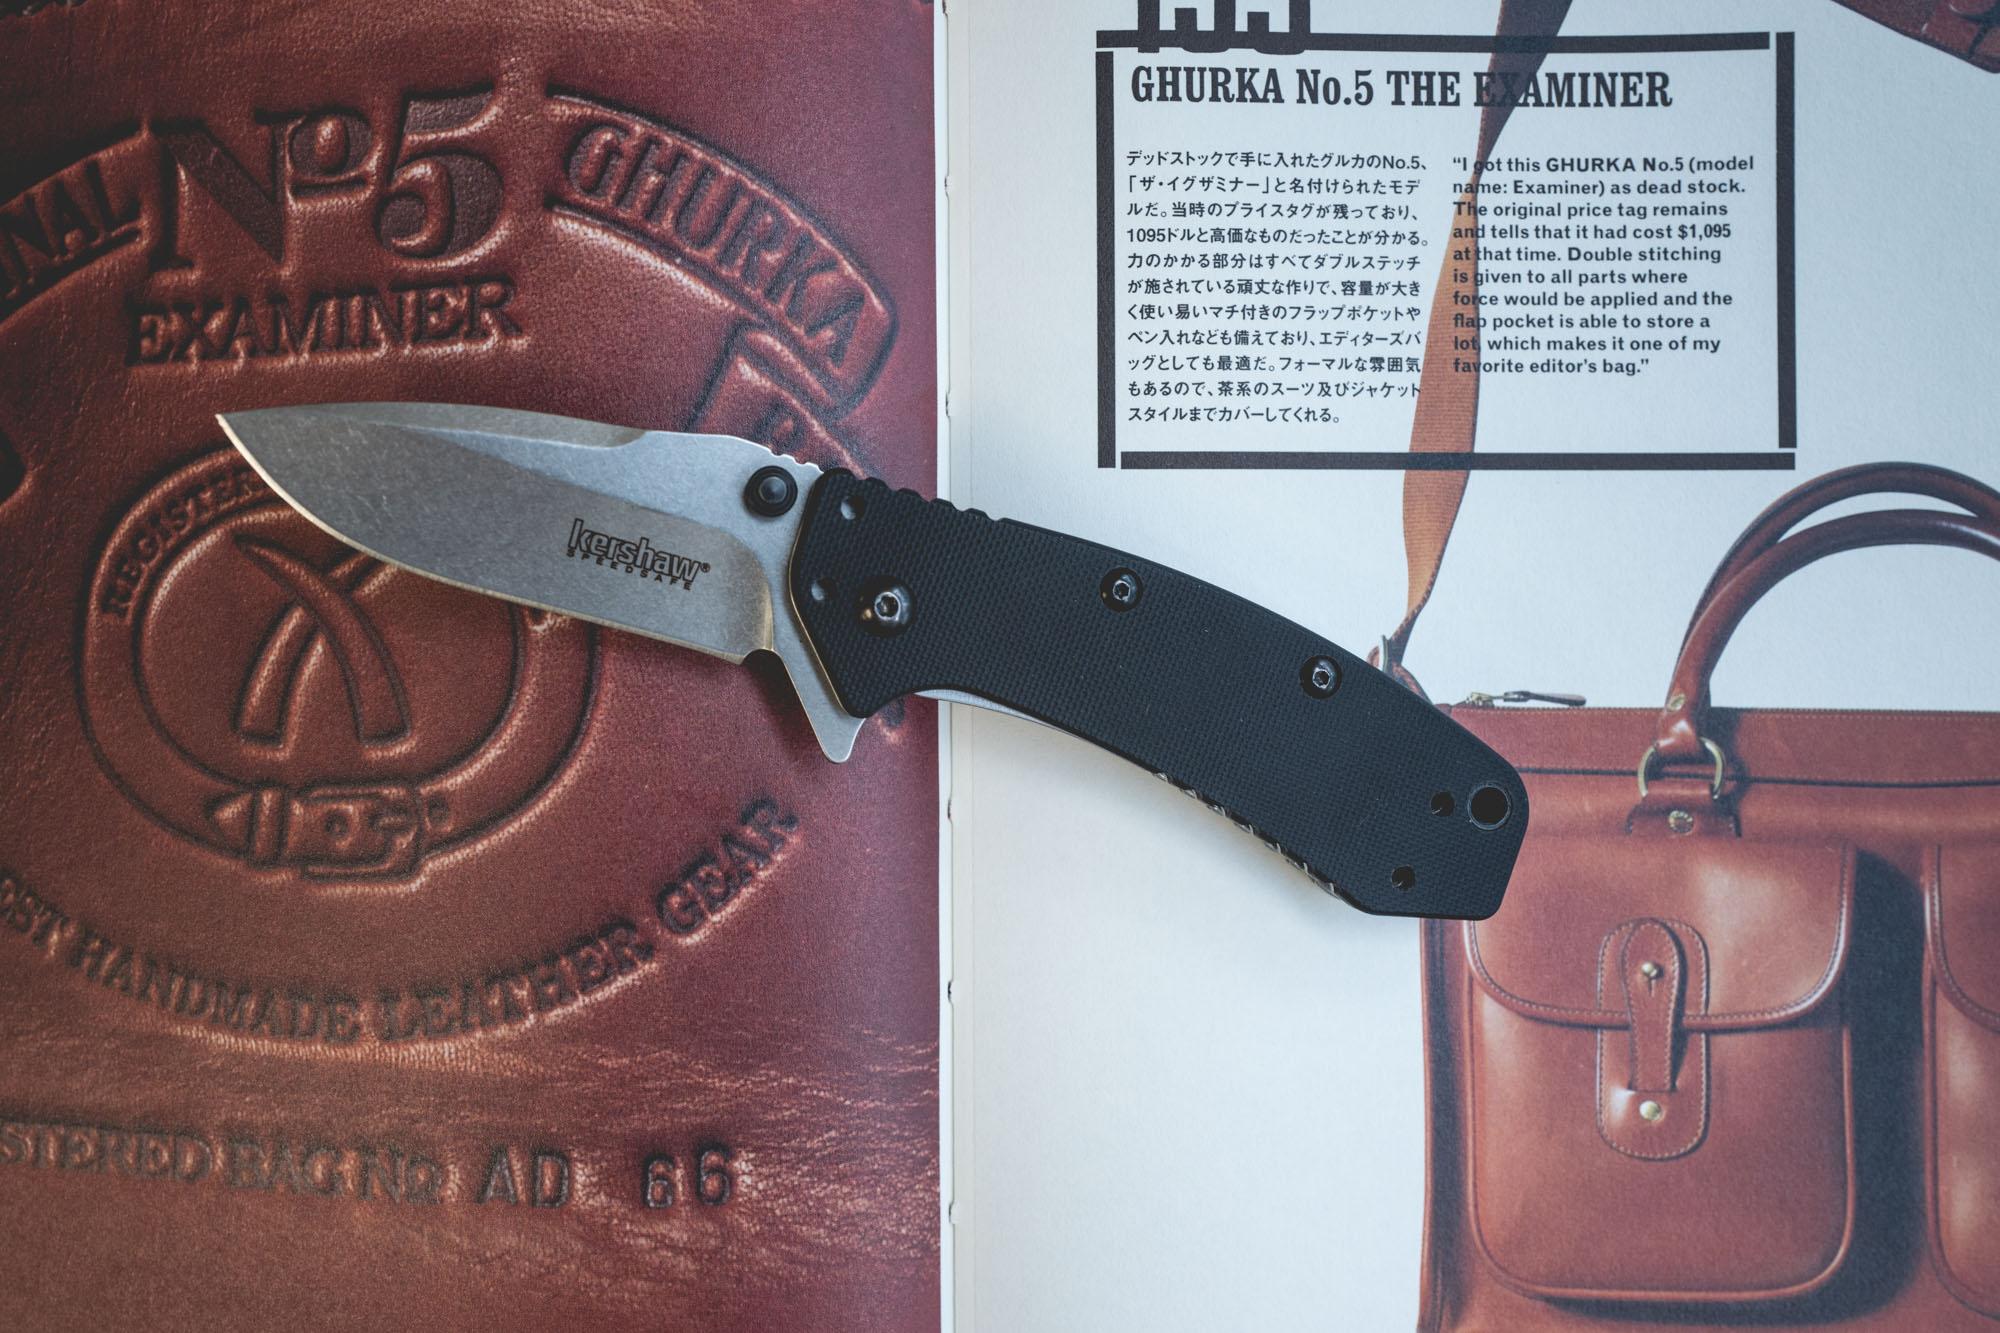 Couteau pliant Kershaw Cryo G10